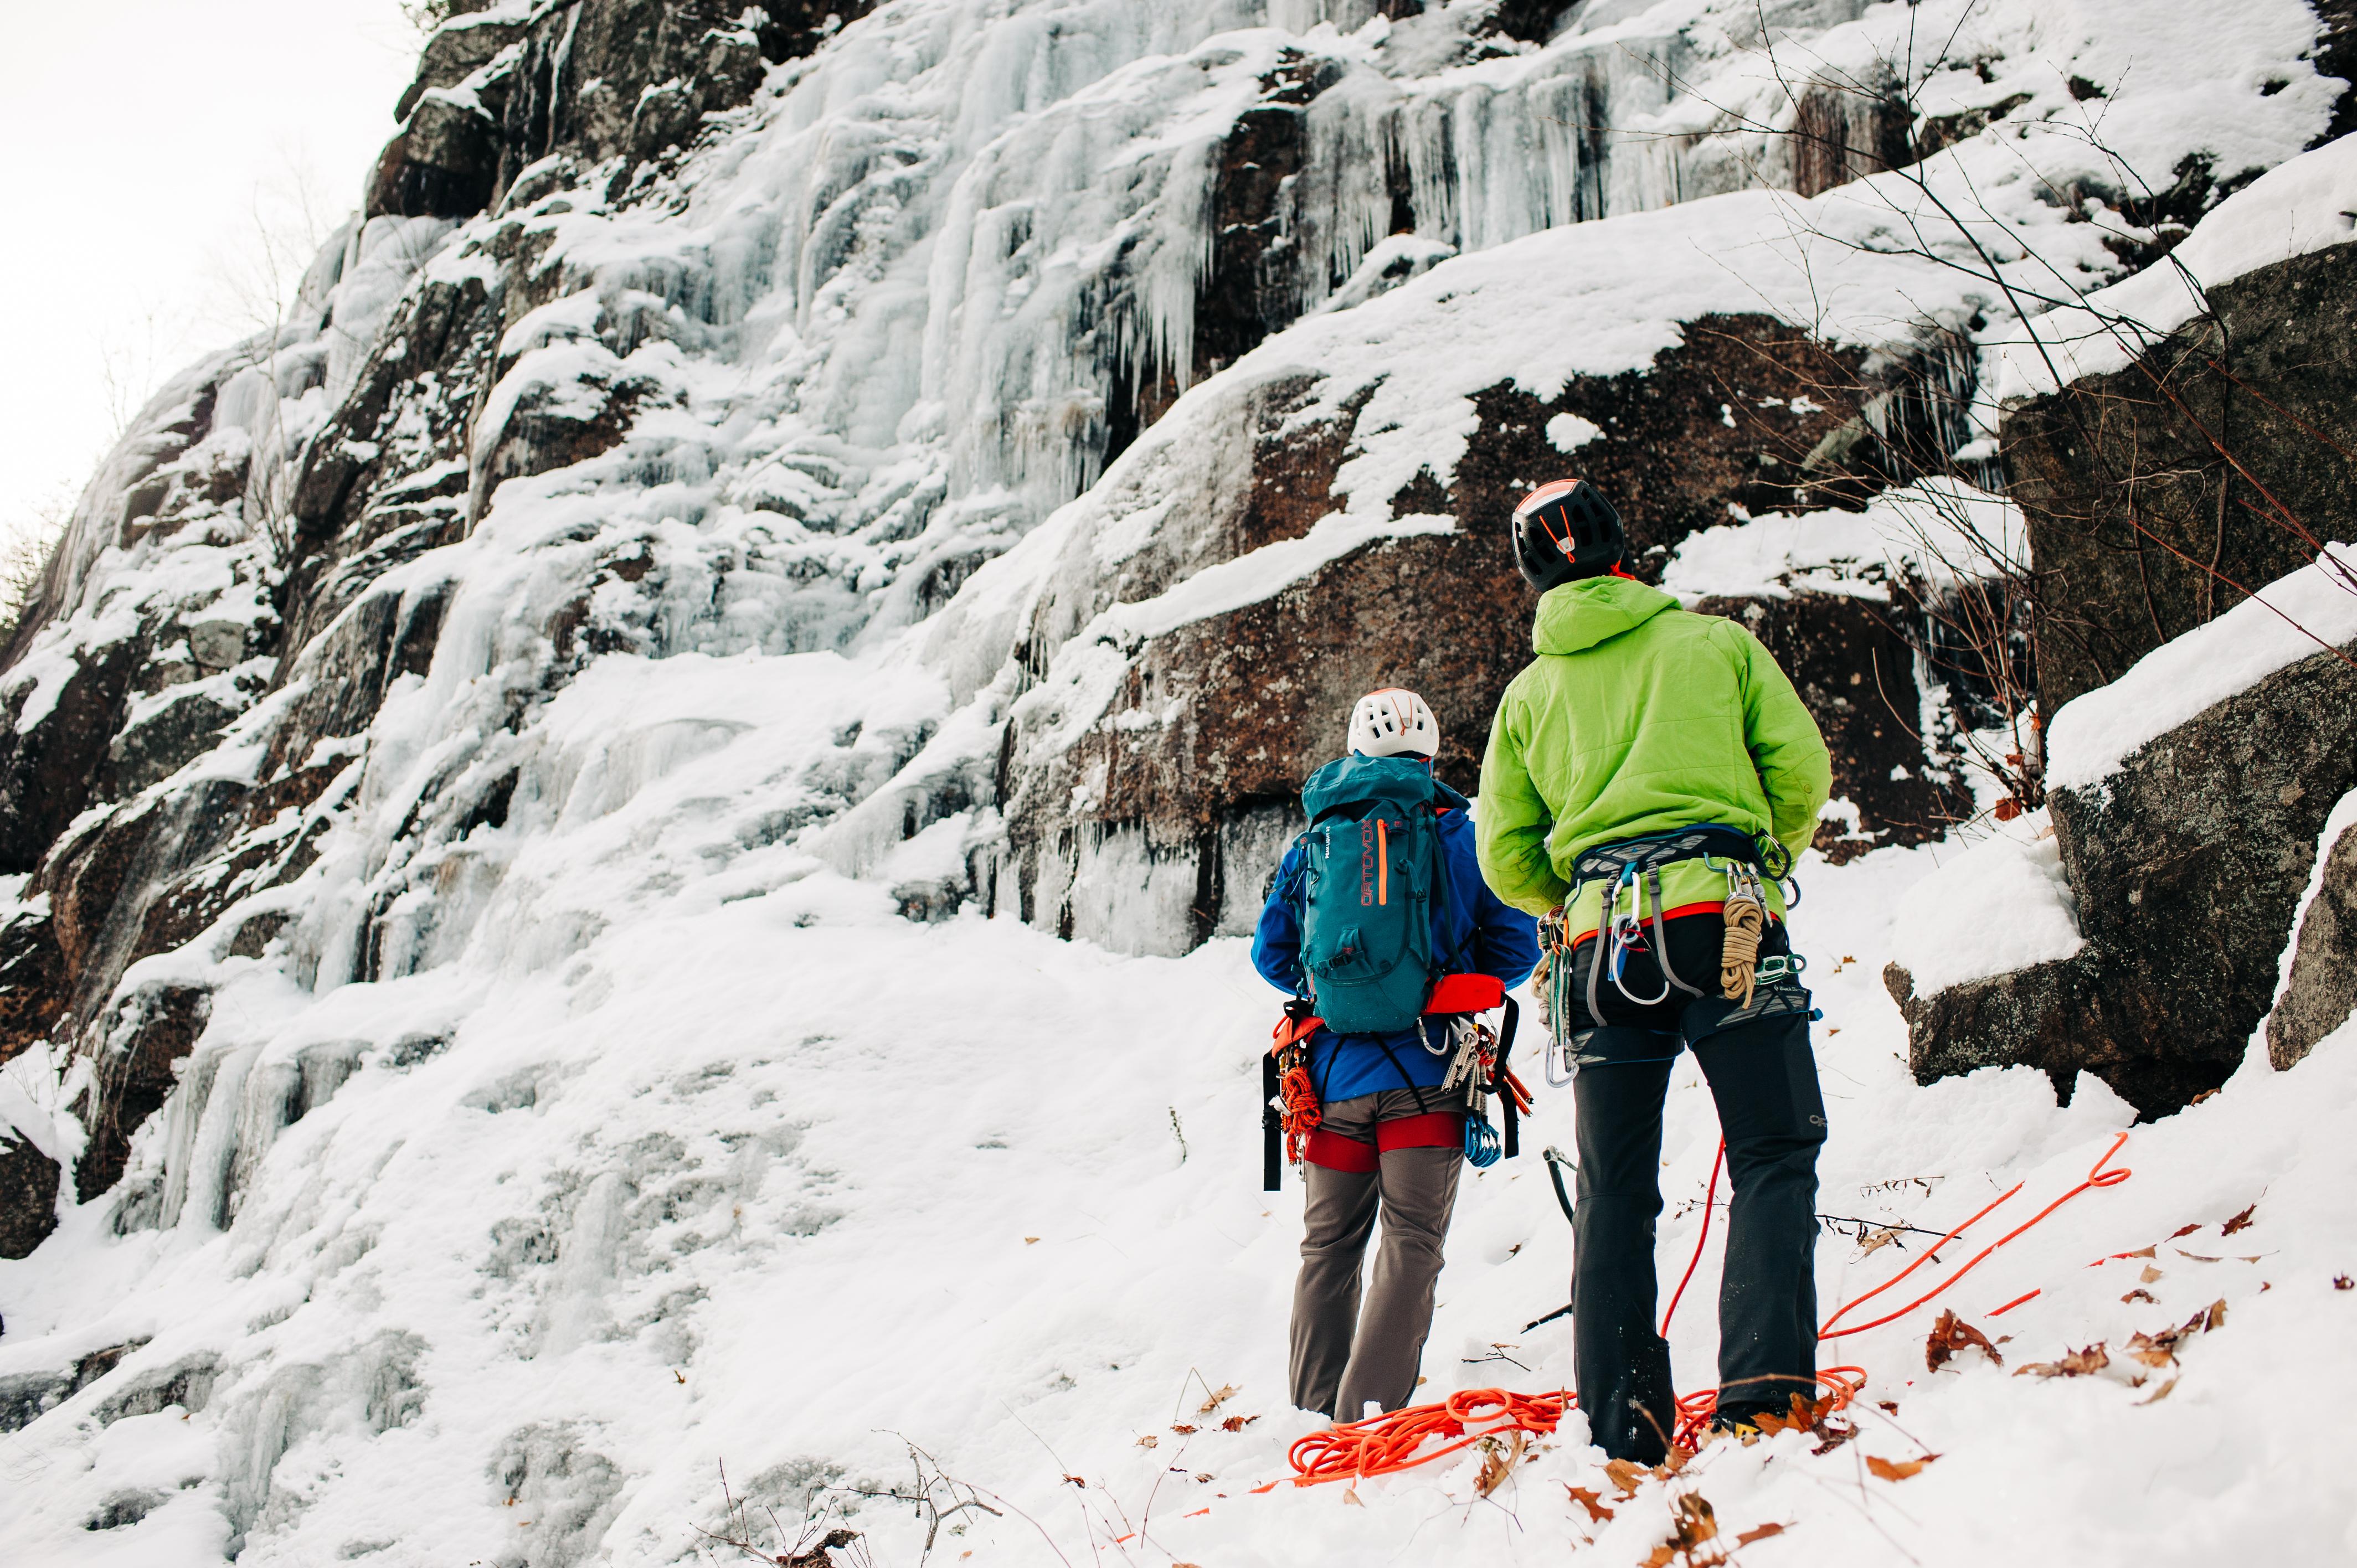 Arc'Teryx FL-365 Climbing Harness Review